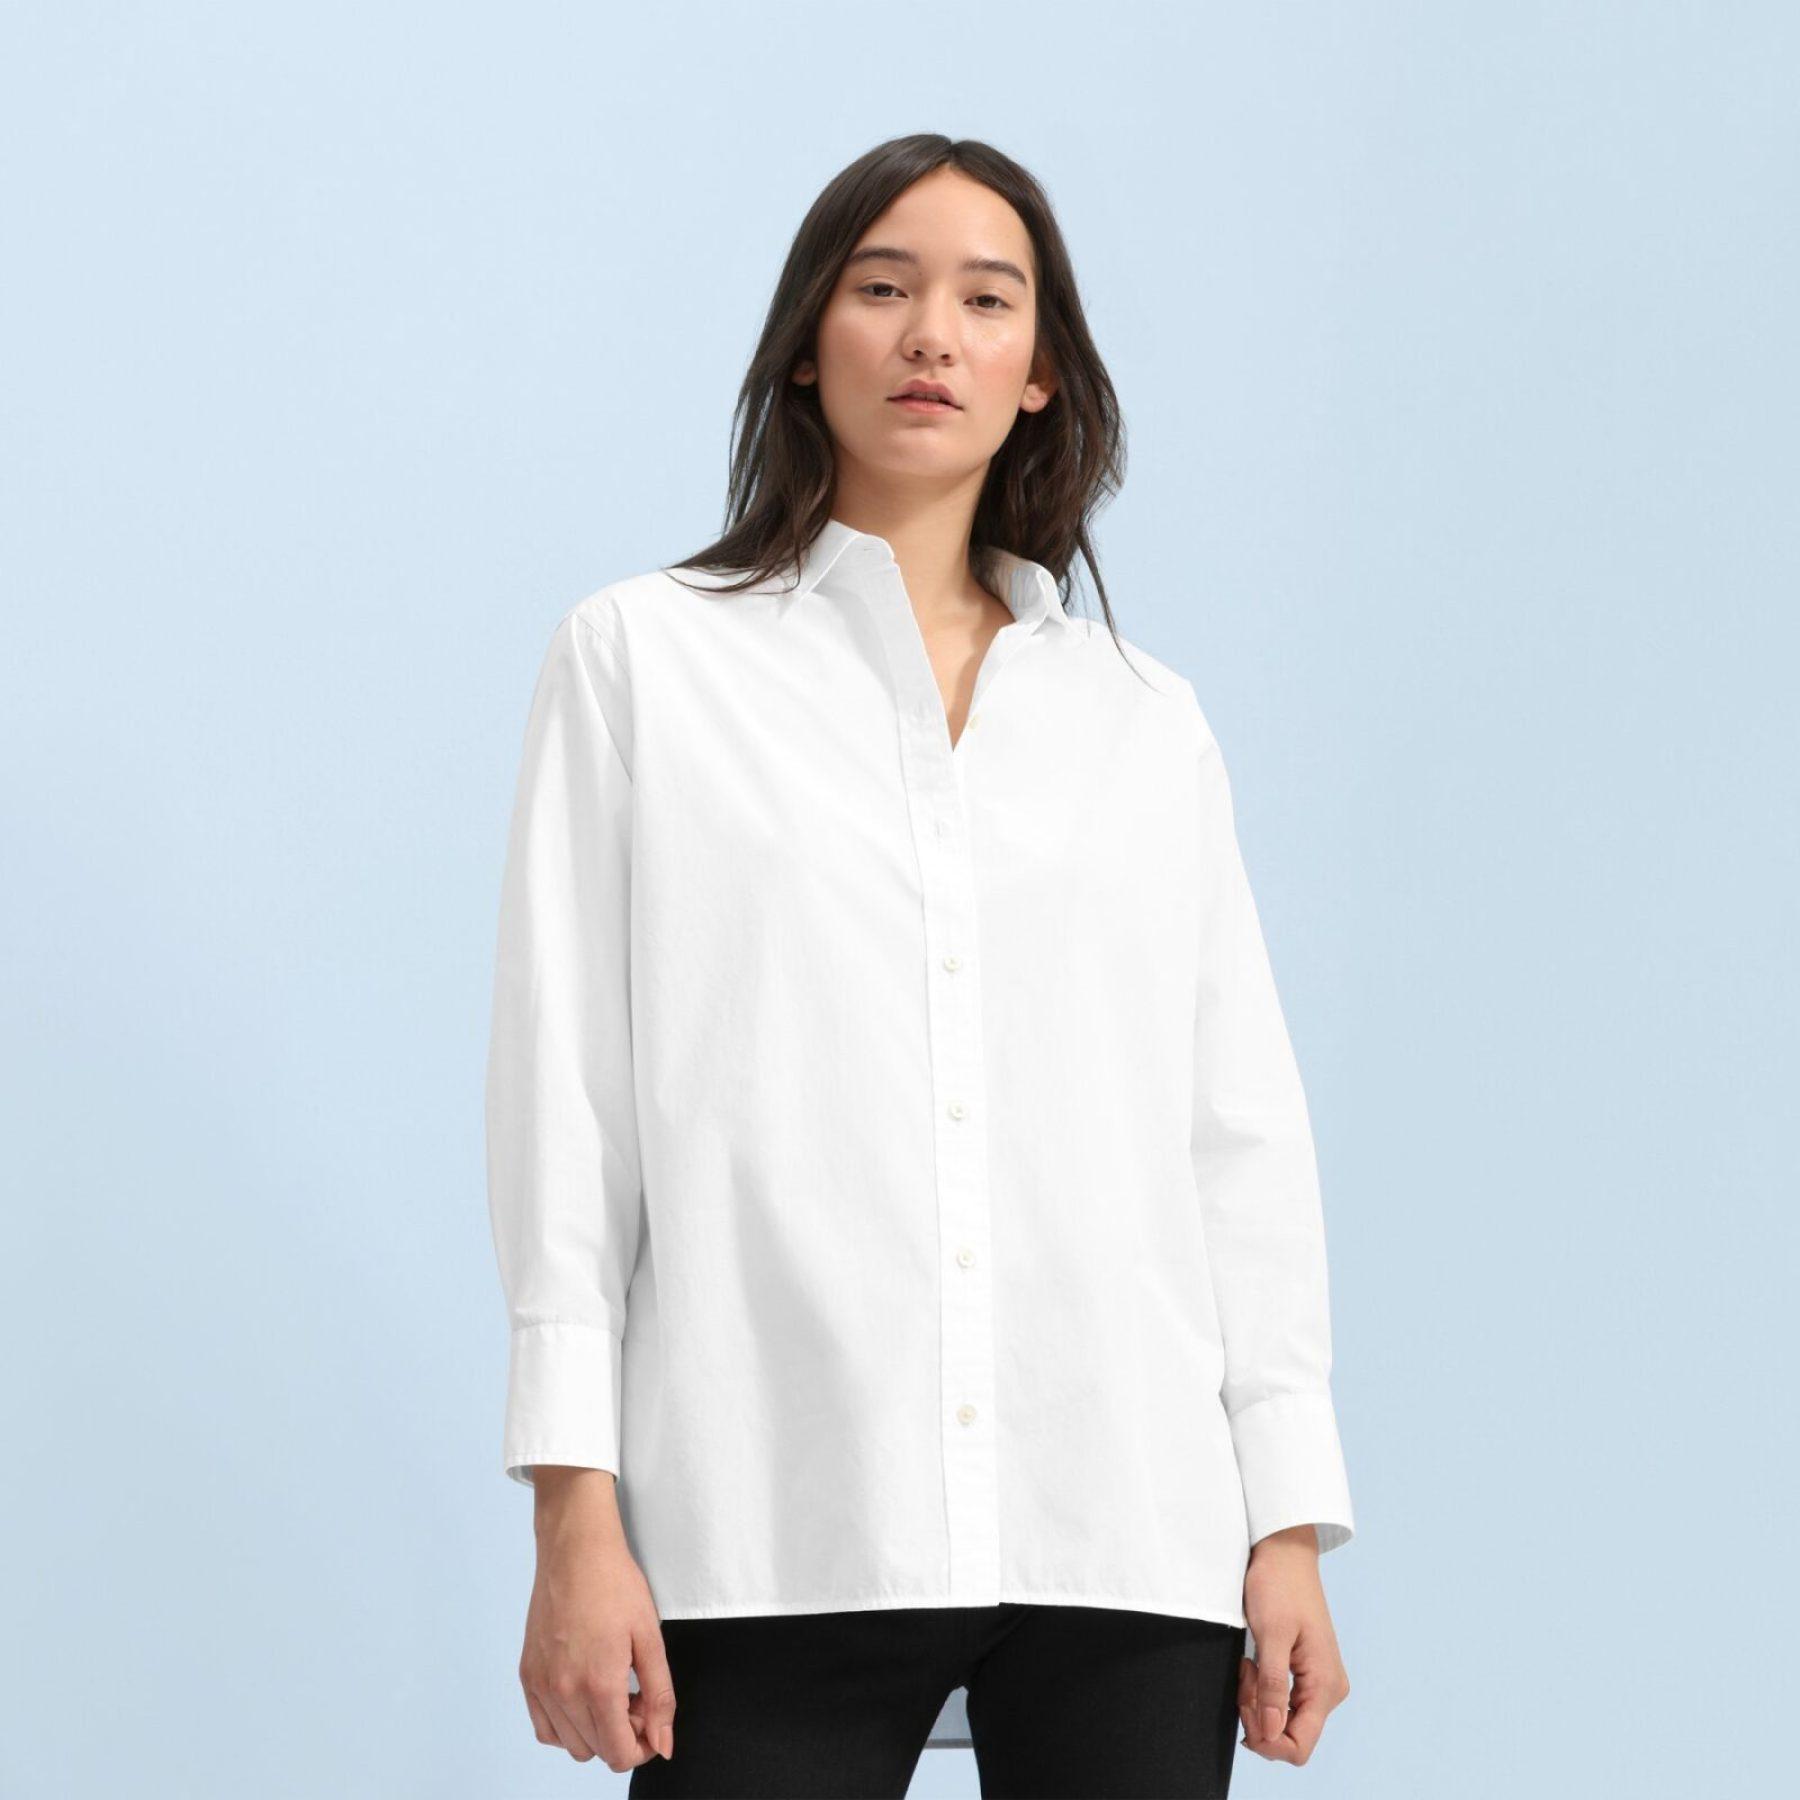 Everlane Oversized Button-up shirt edit seven 2018 toronto